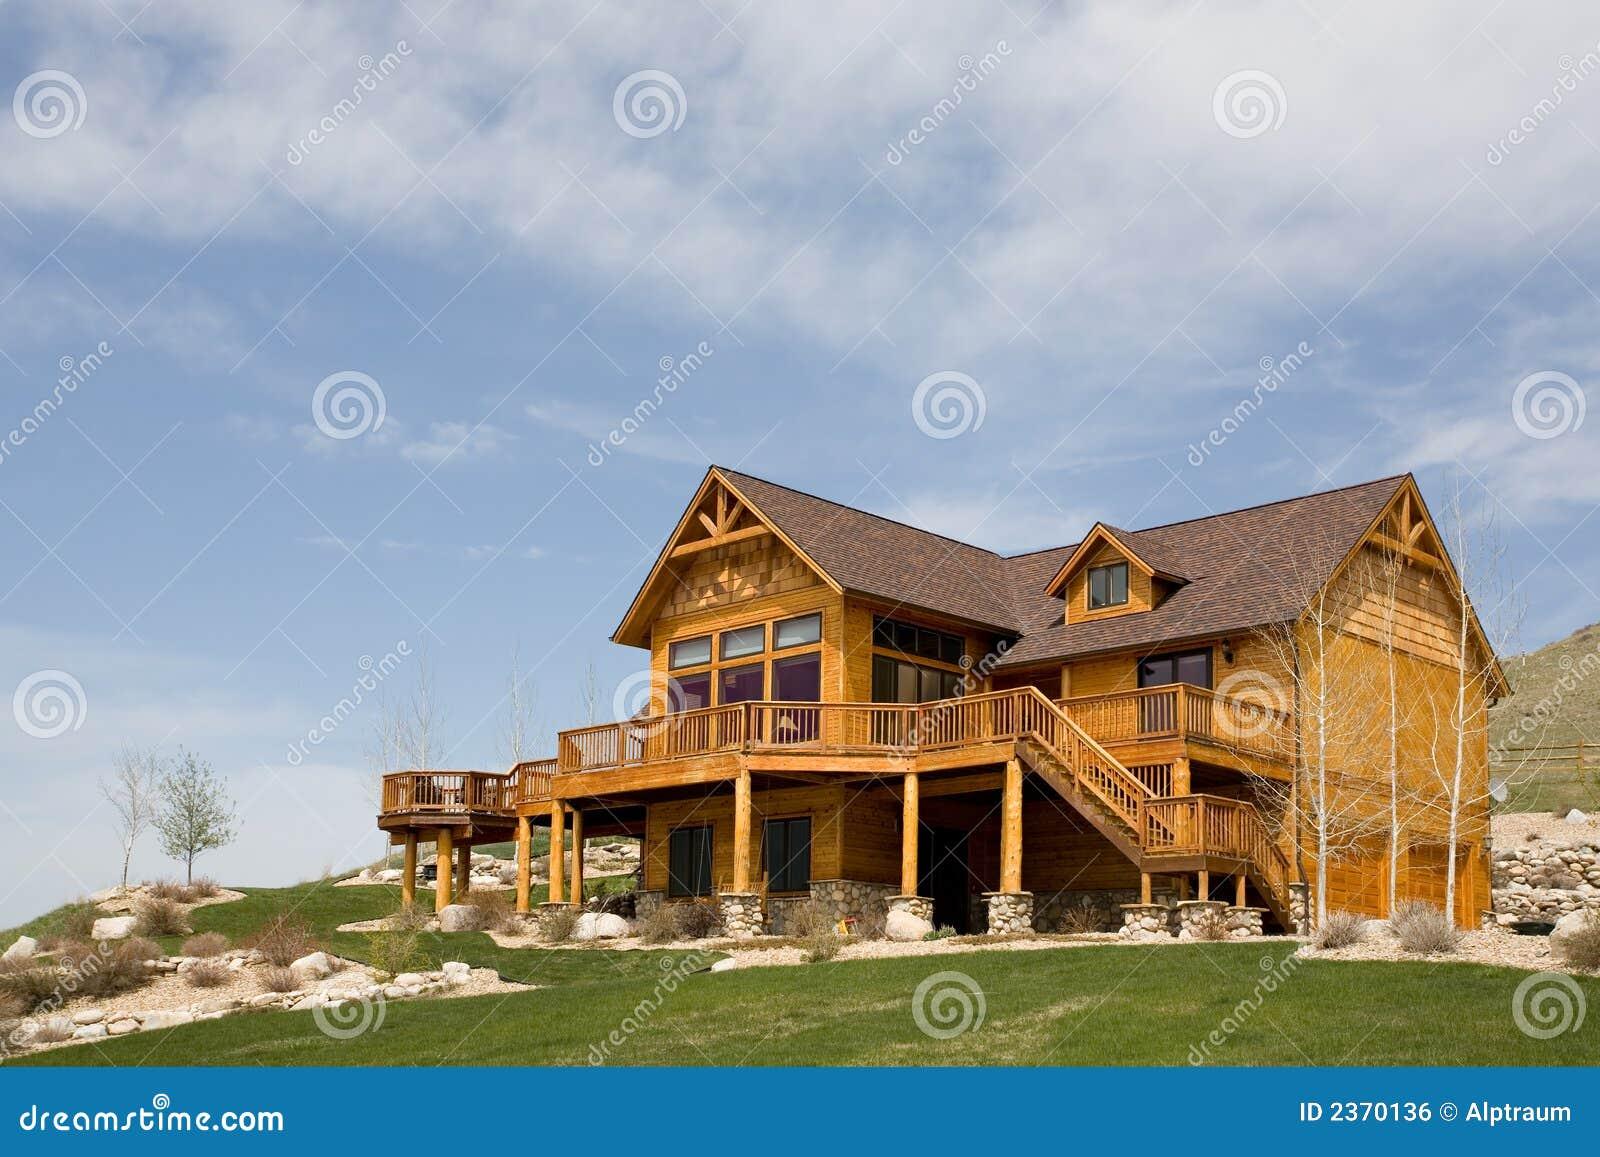 House on a hillside